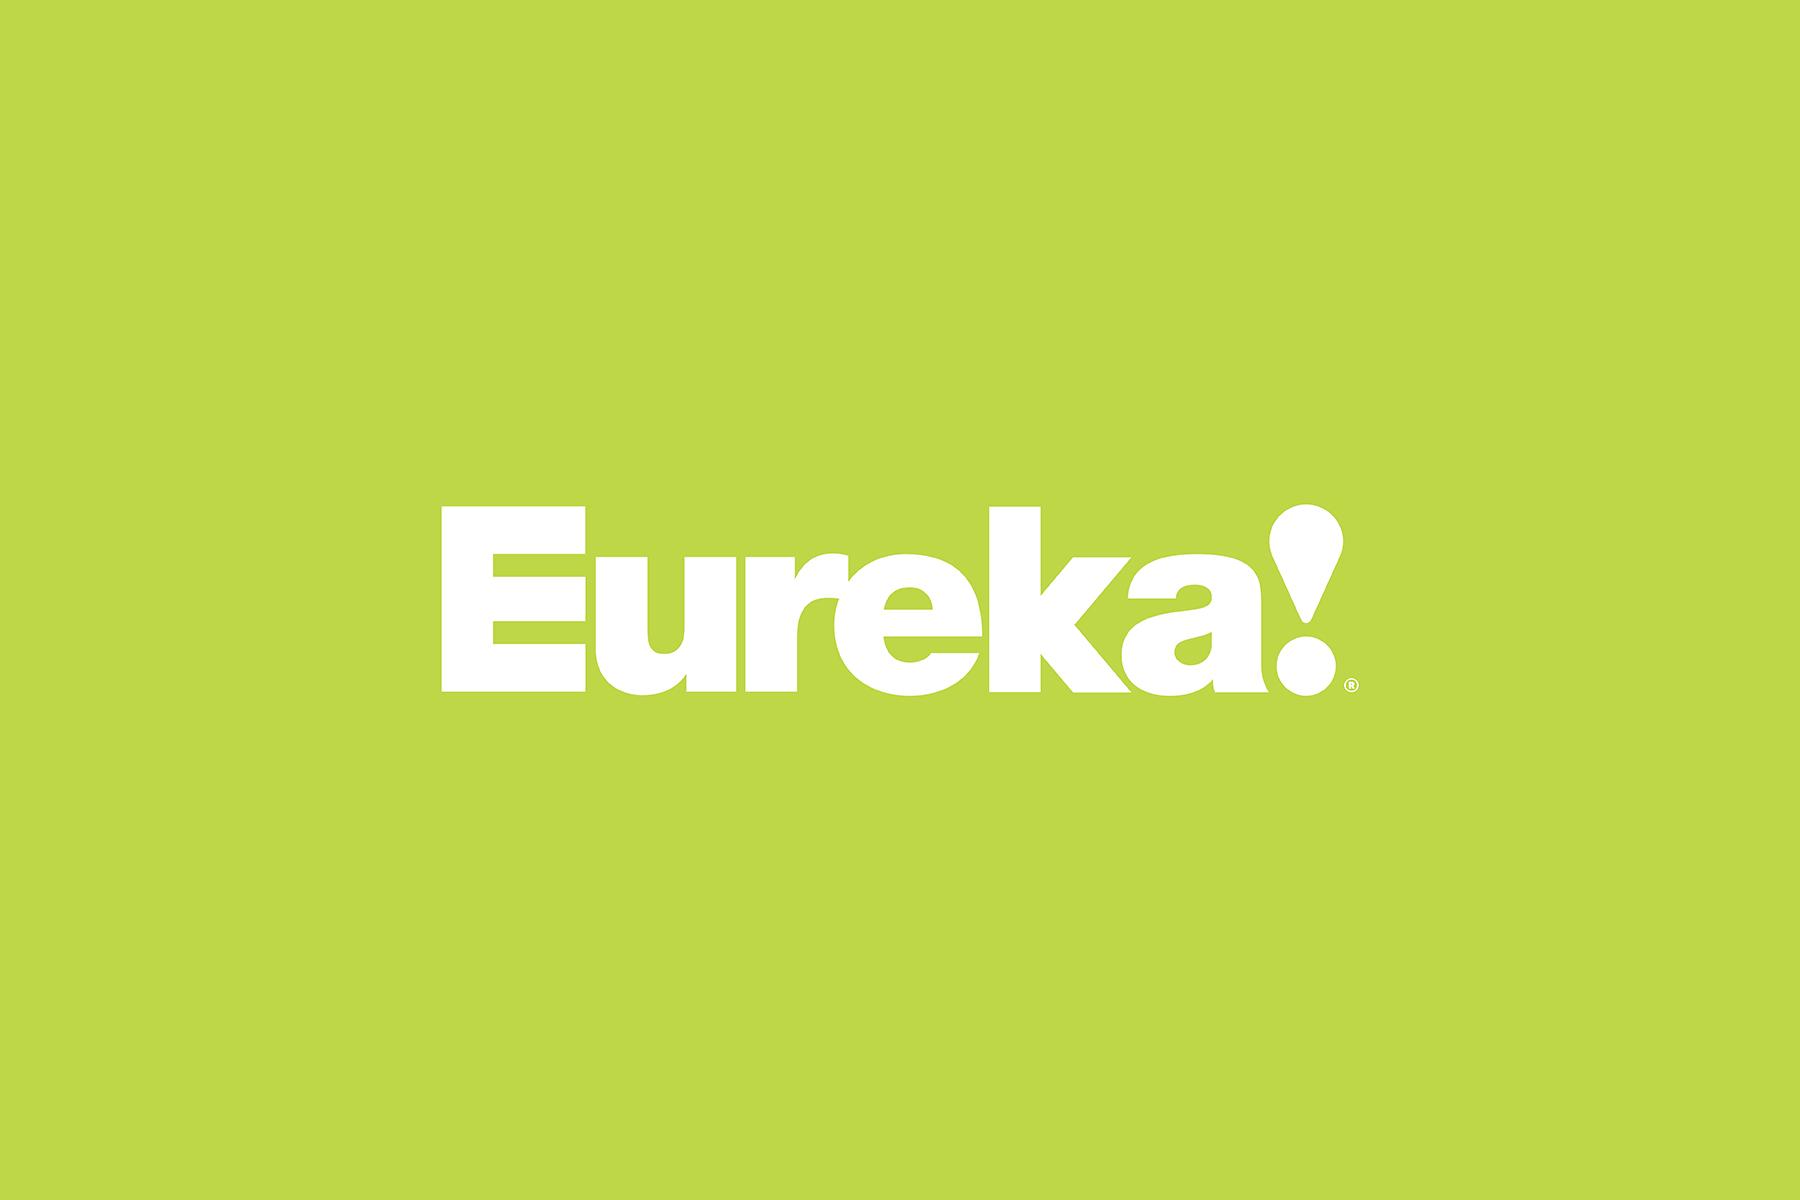 Eureka! Brand Evolution